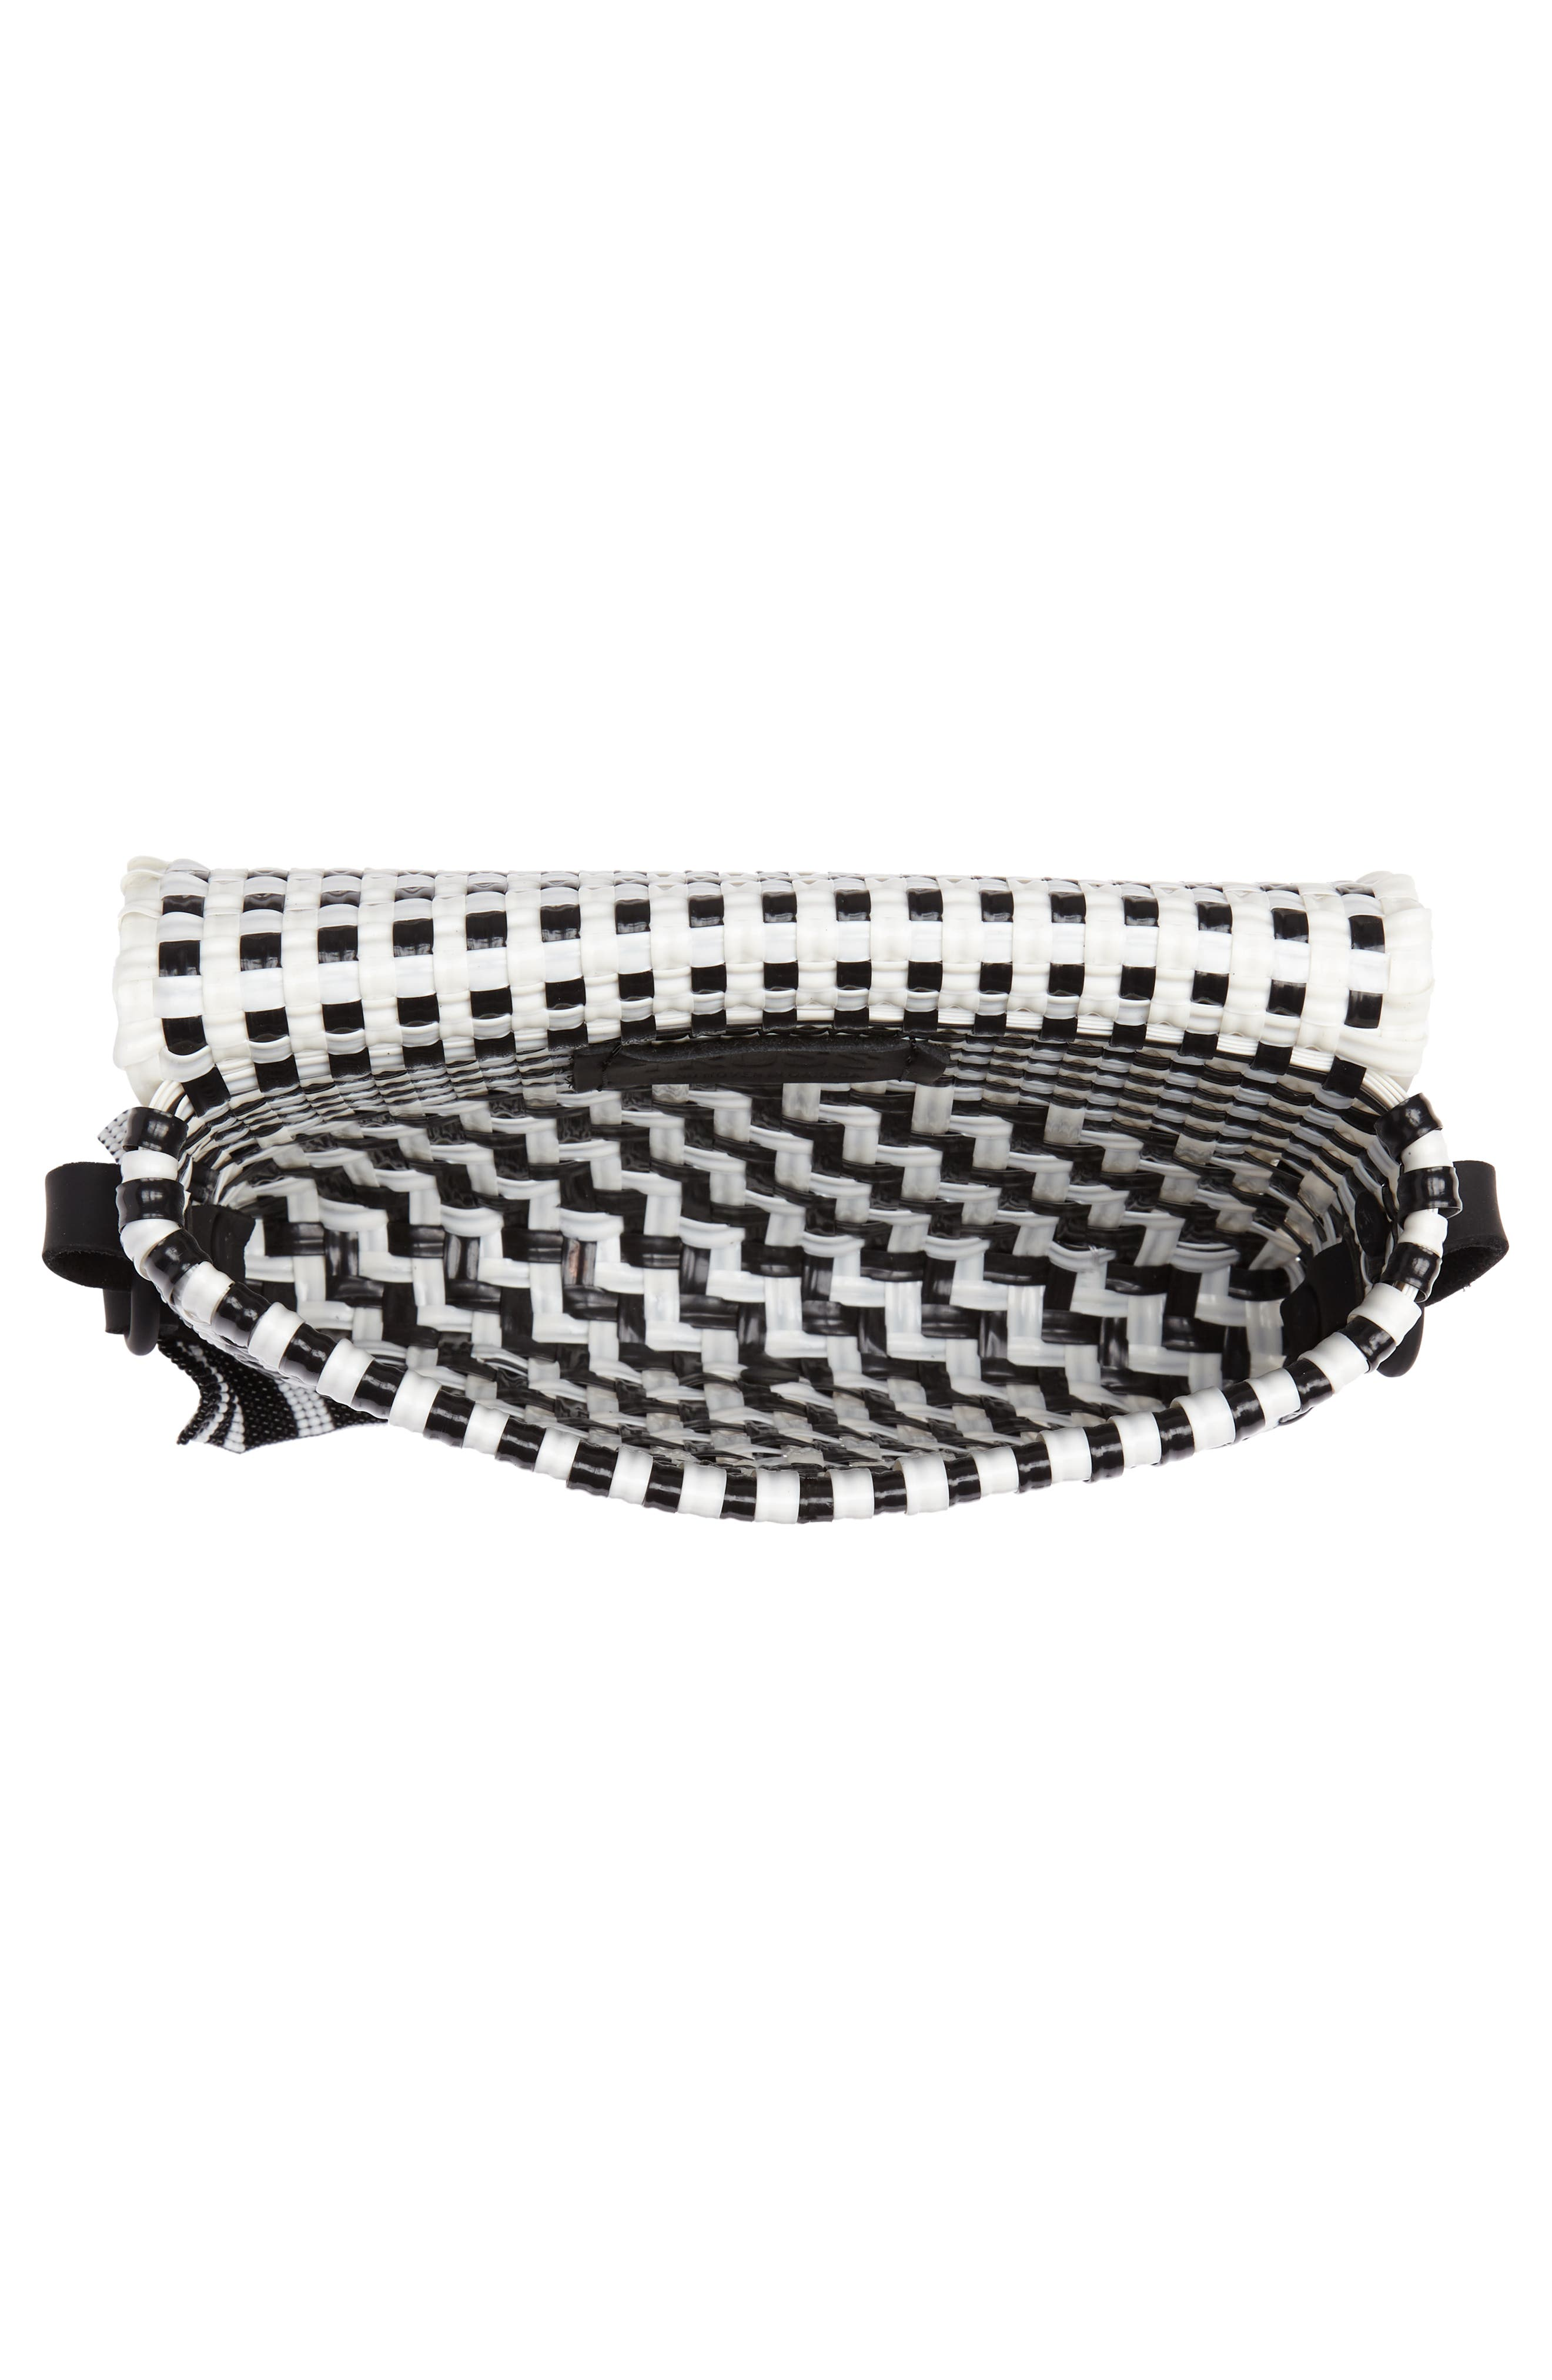 Woven Baguette Shoulder Bag,                             Alternate thumbnail 4, color,                             BLACK/ WHITE